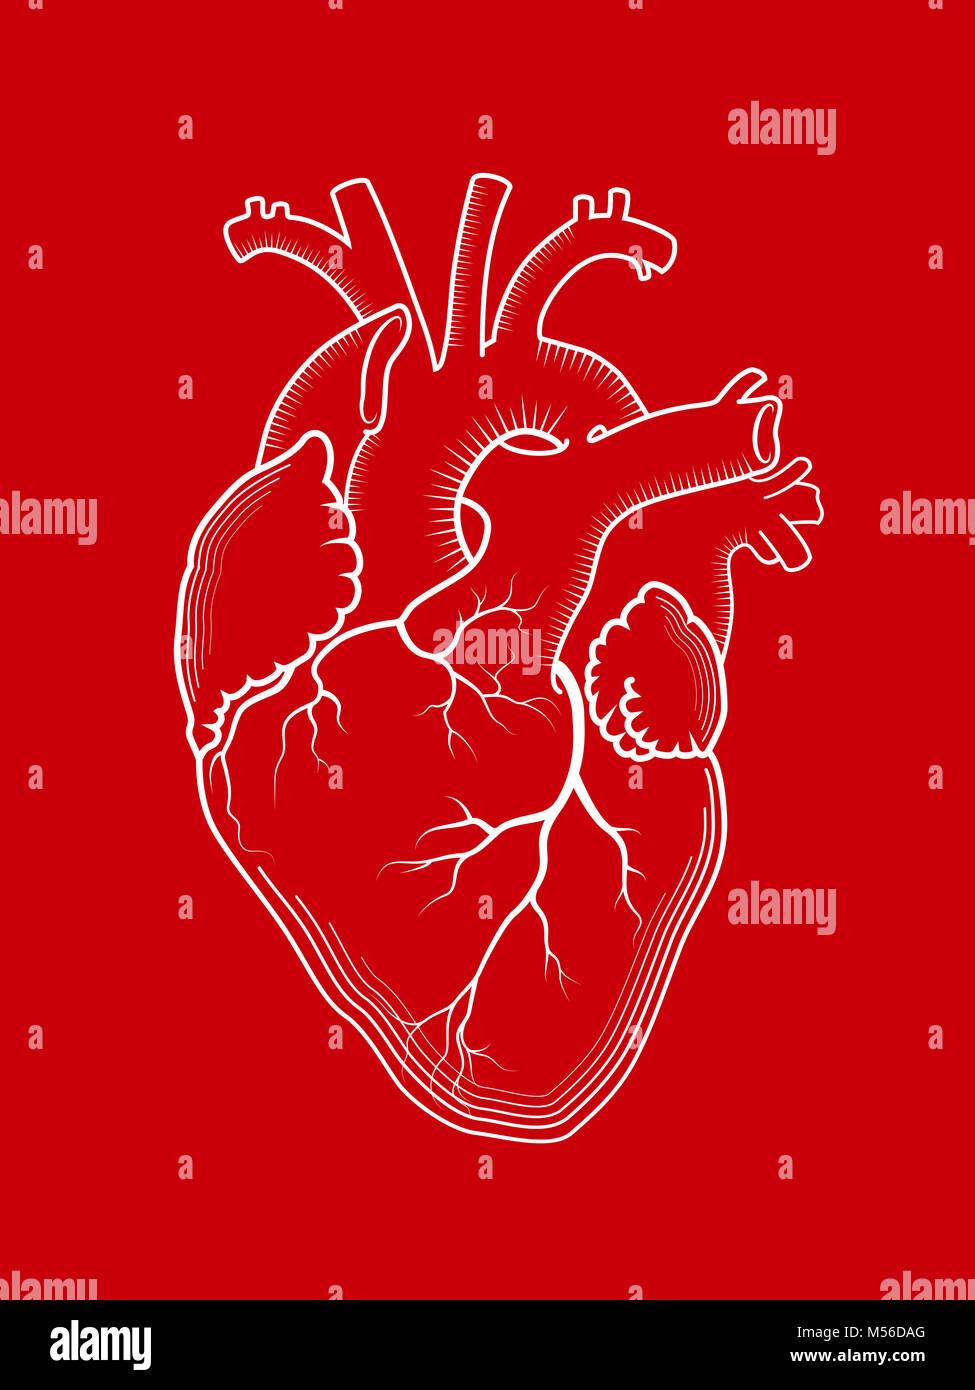 Heart. The internal human organ, anatomical structure. - Stock Image